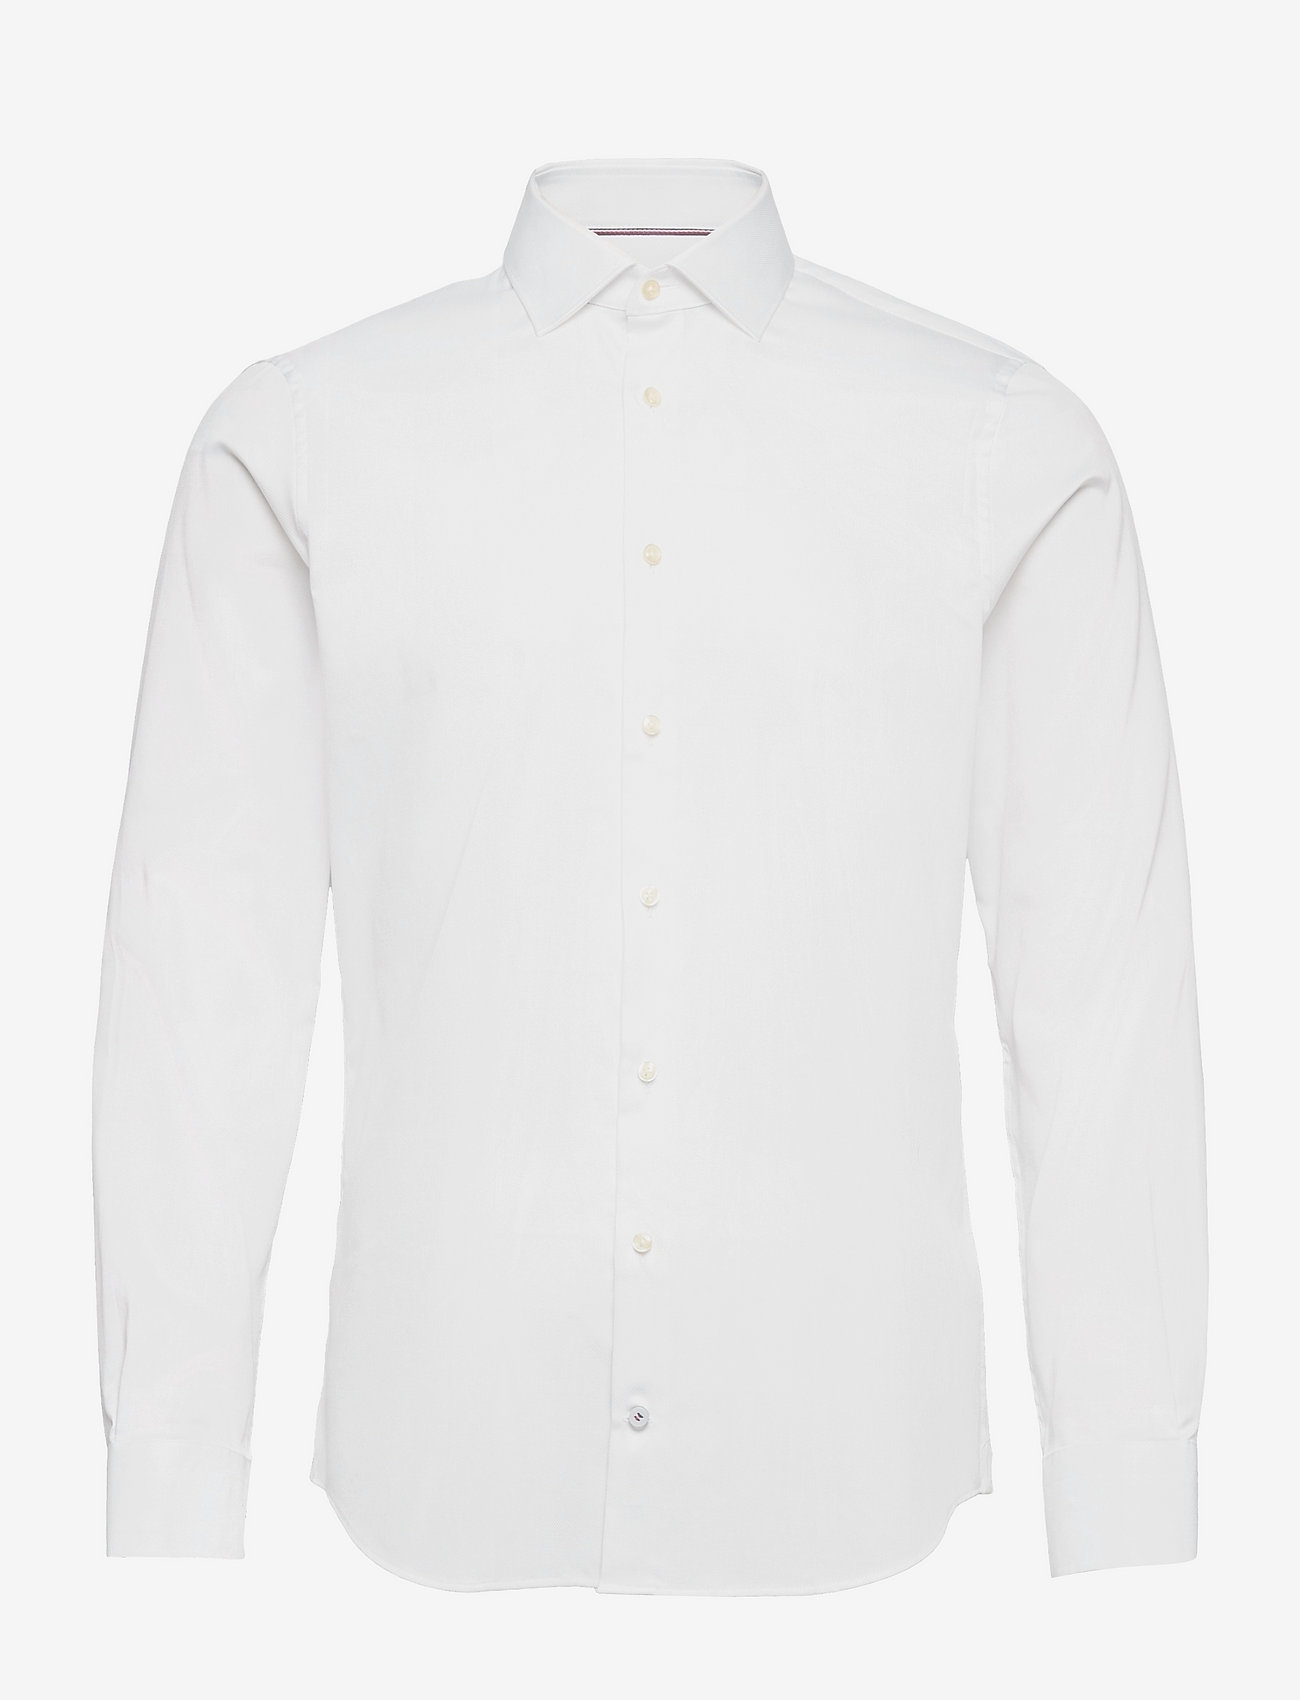 Tommy Hilfiger Tailored - DOBBY FLEX COLLAR SLIM SHIRT - basic shirts - white - 0